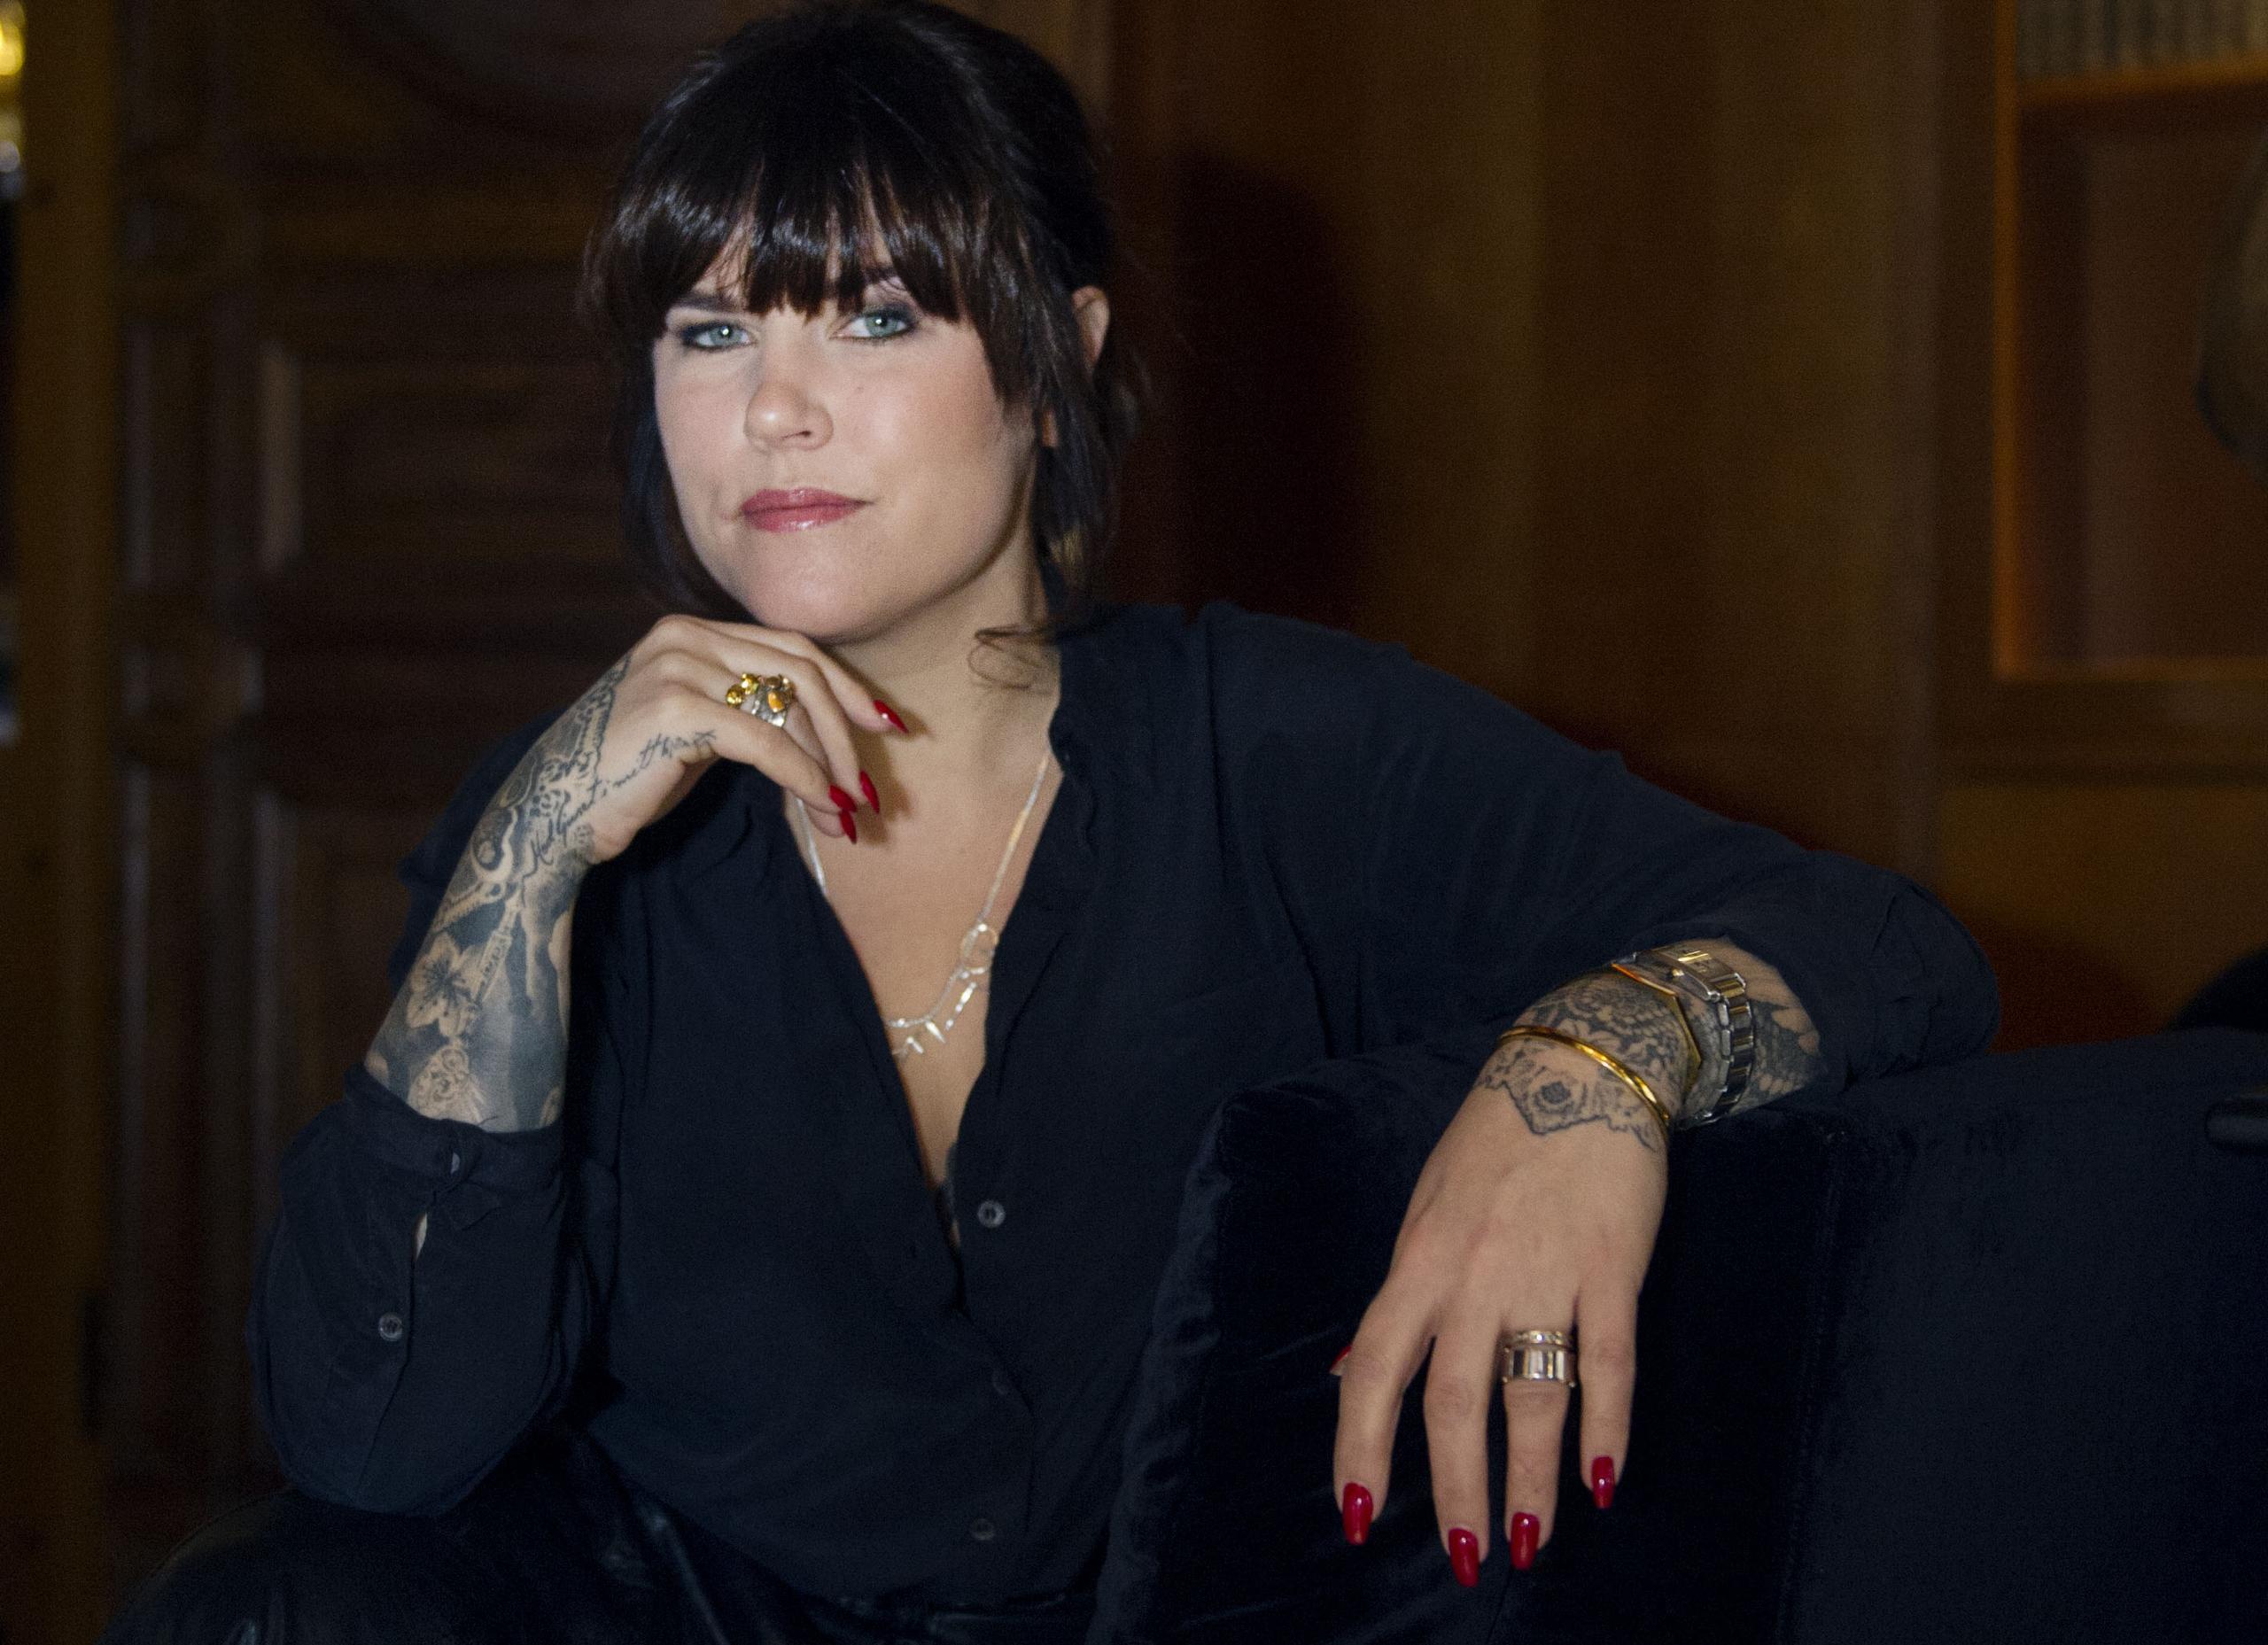 Mia Skäringer om utsattheten som kvinnlig komiker